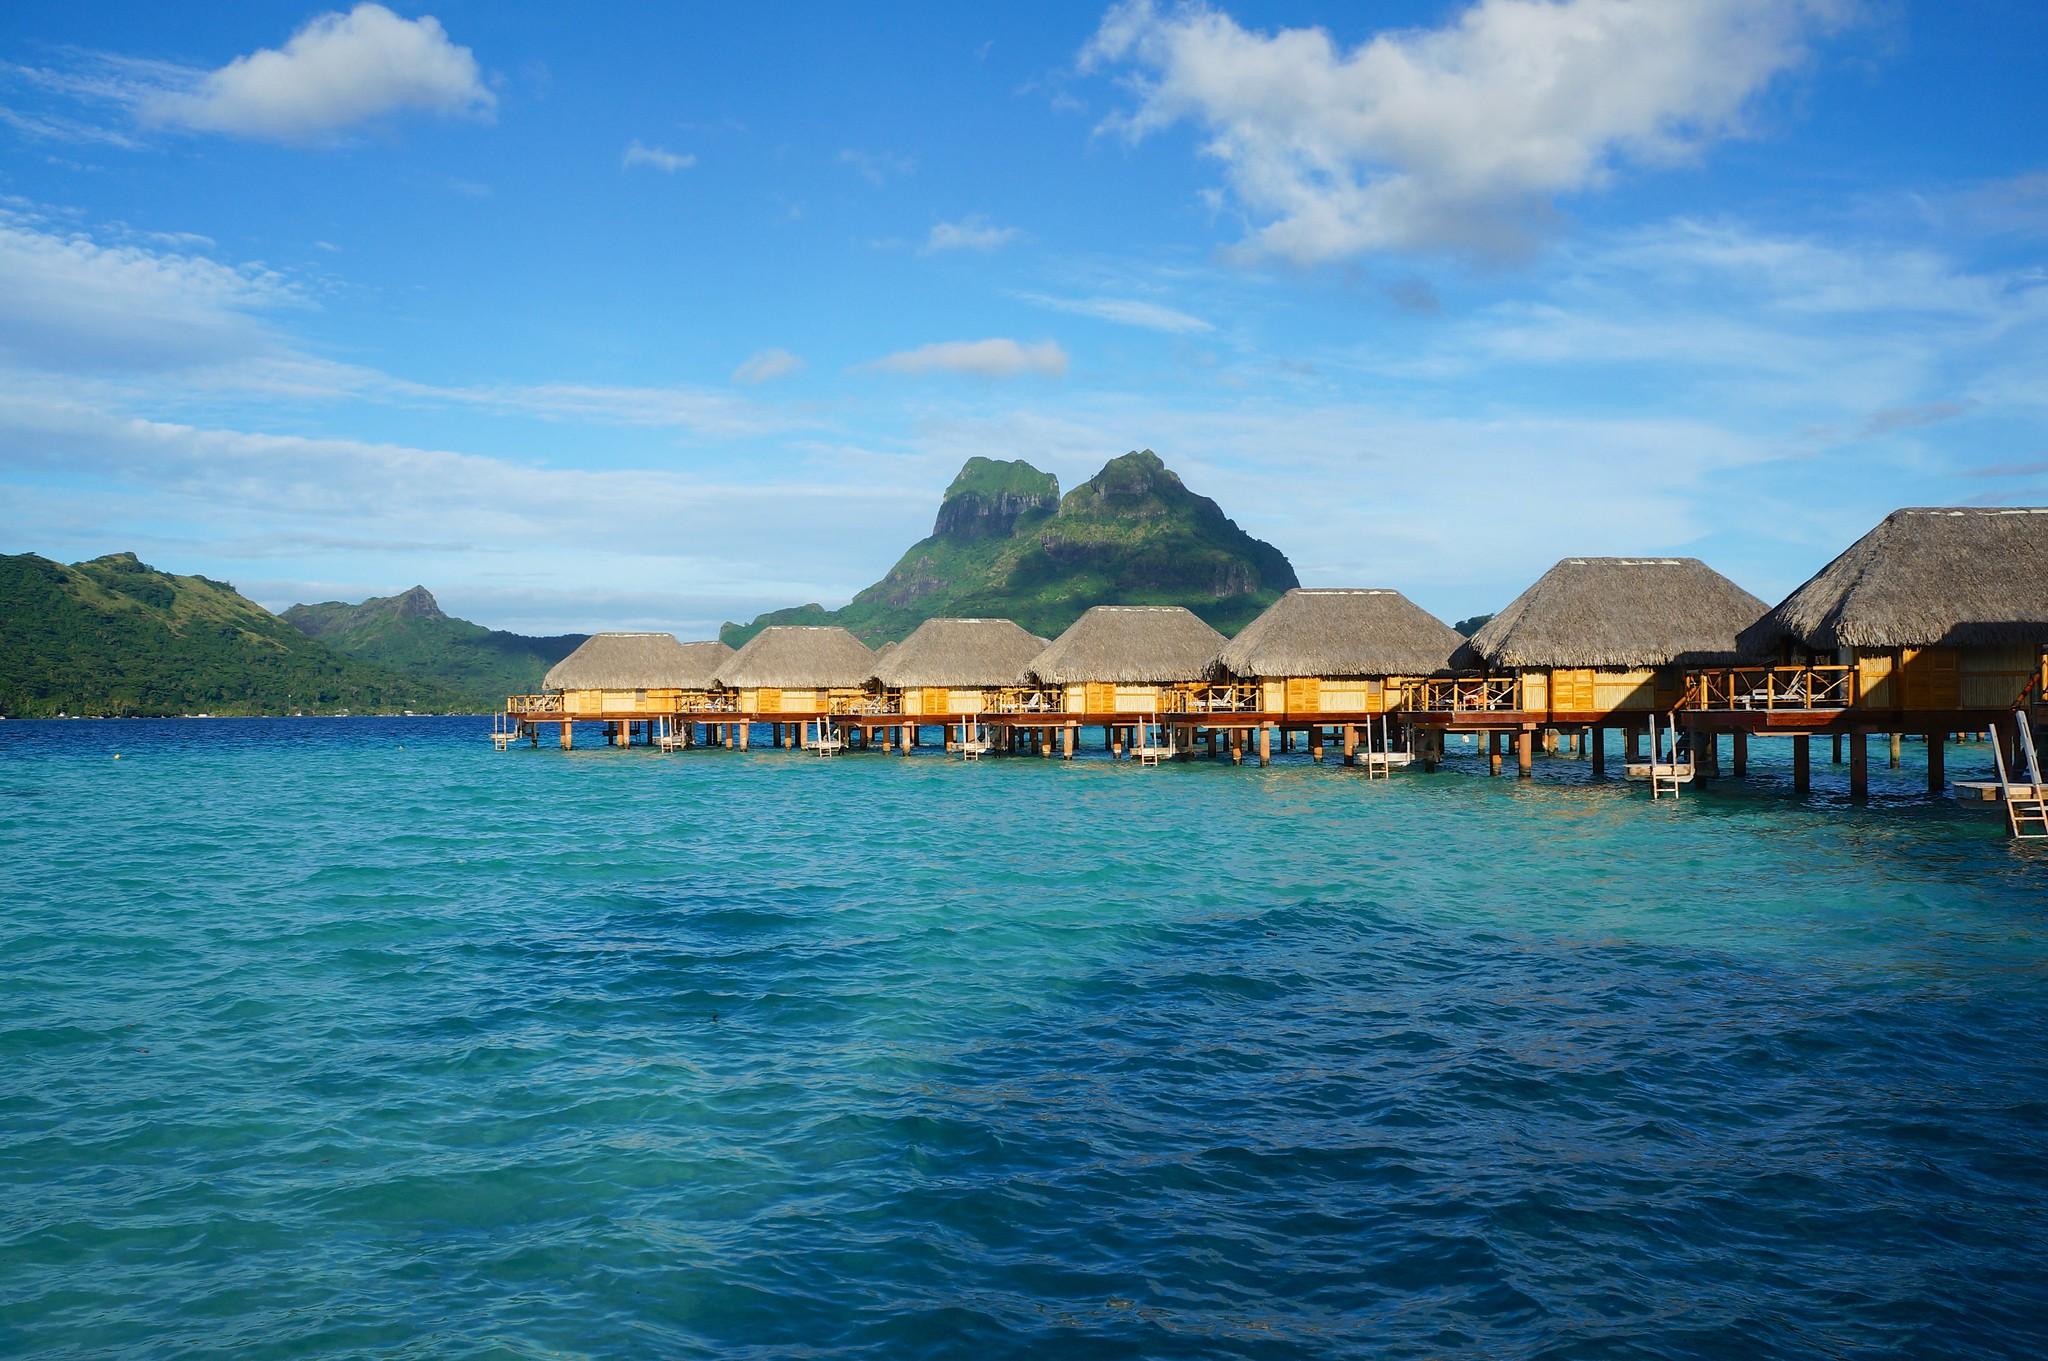 Bora Boraaaa